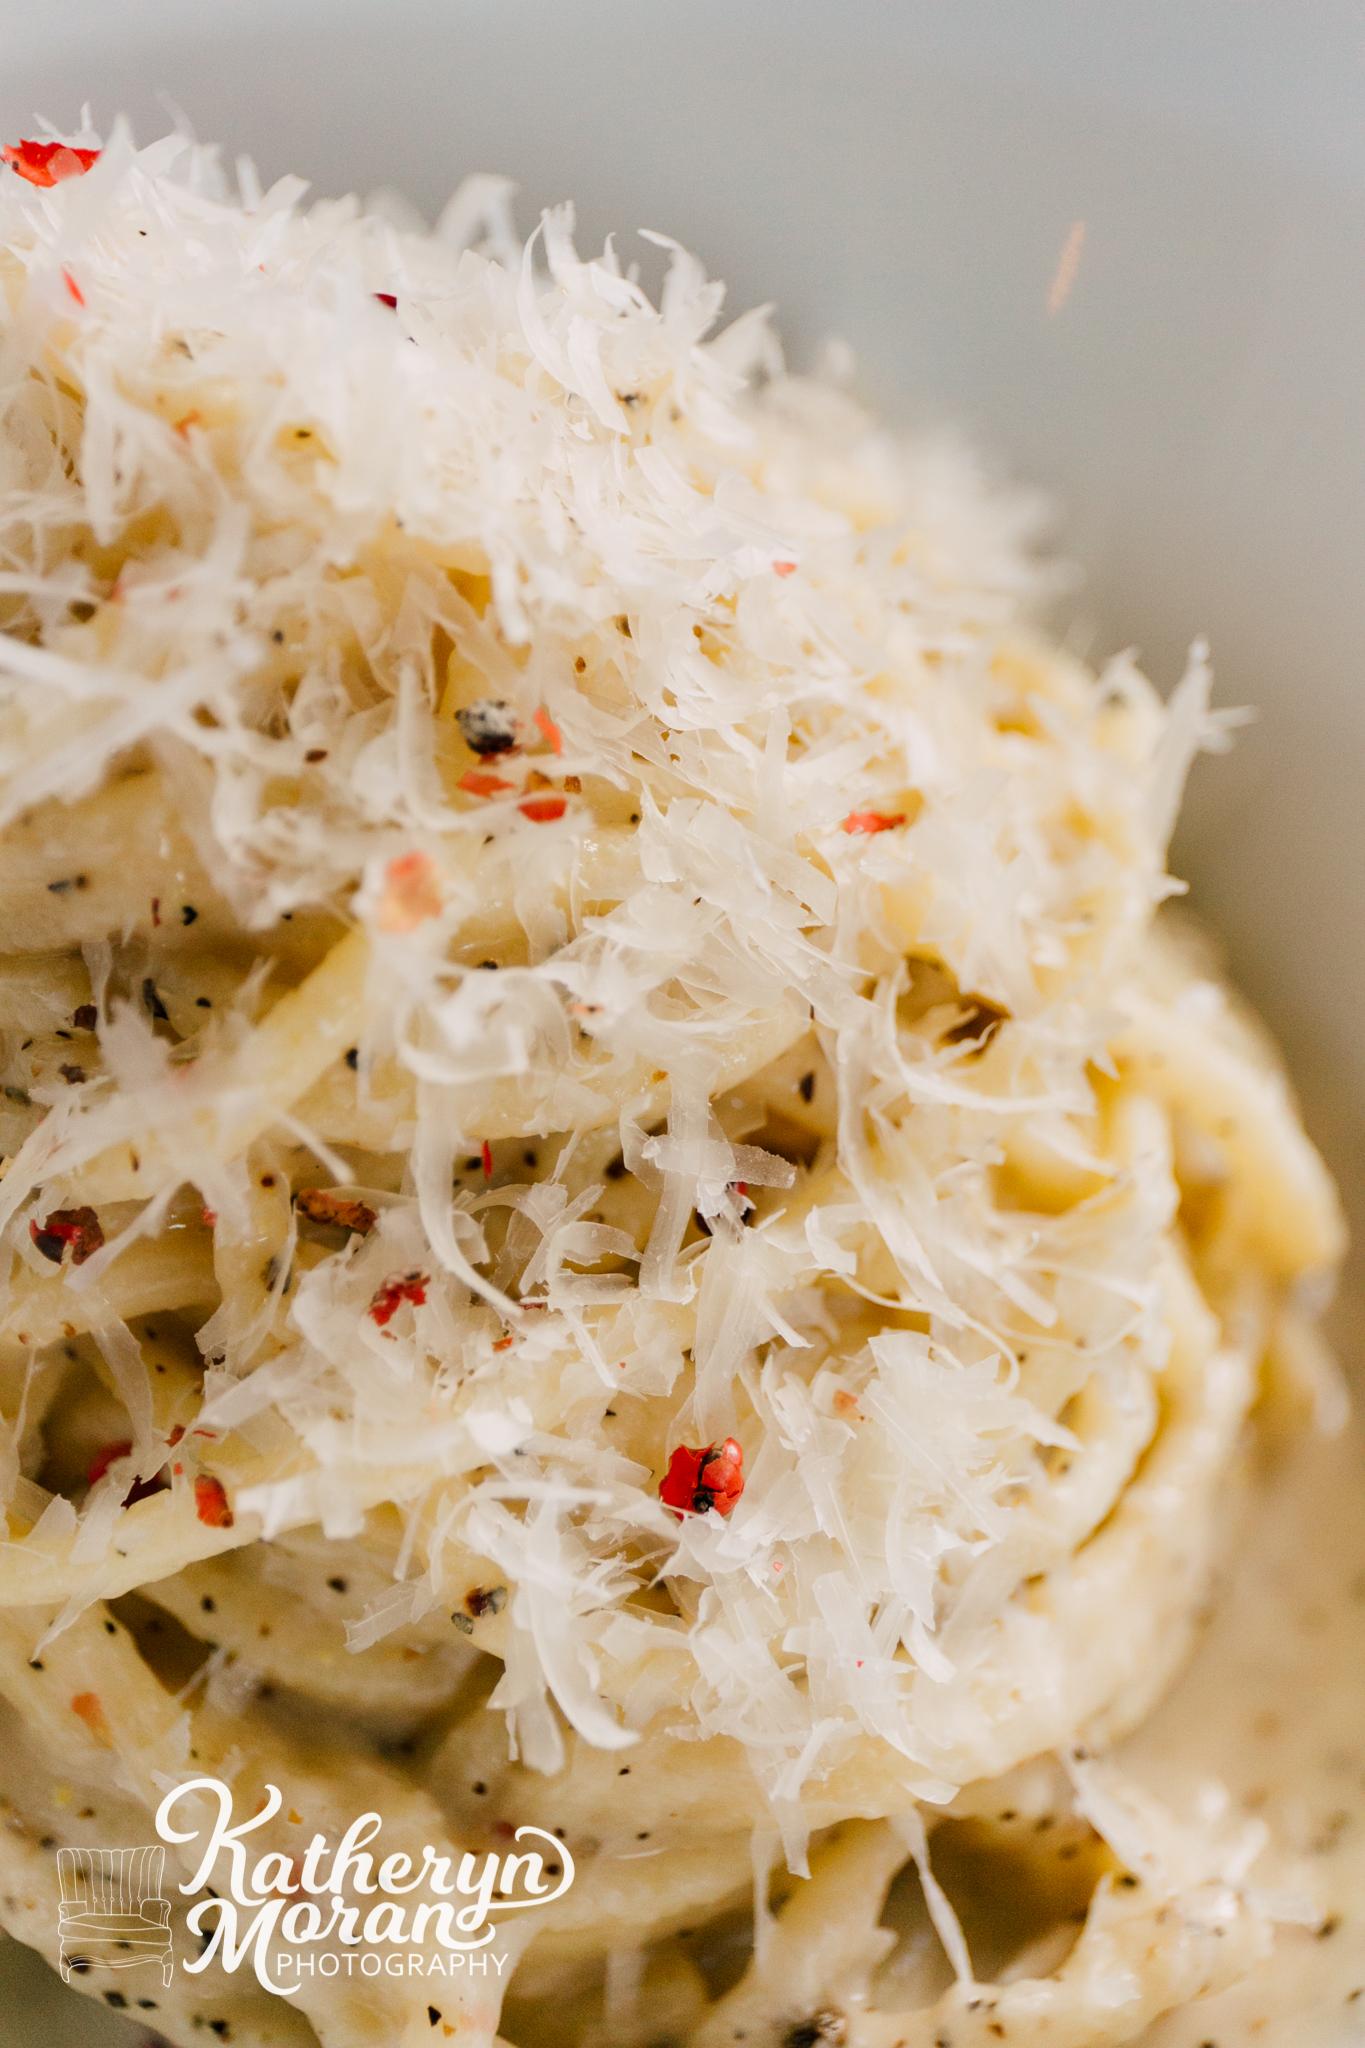 seattle-food-photographer-katheryn-moran-due-cucuina-italiana-2018-12.jpg